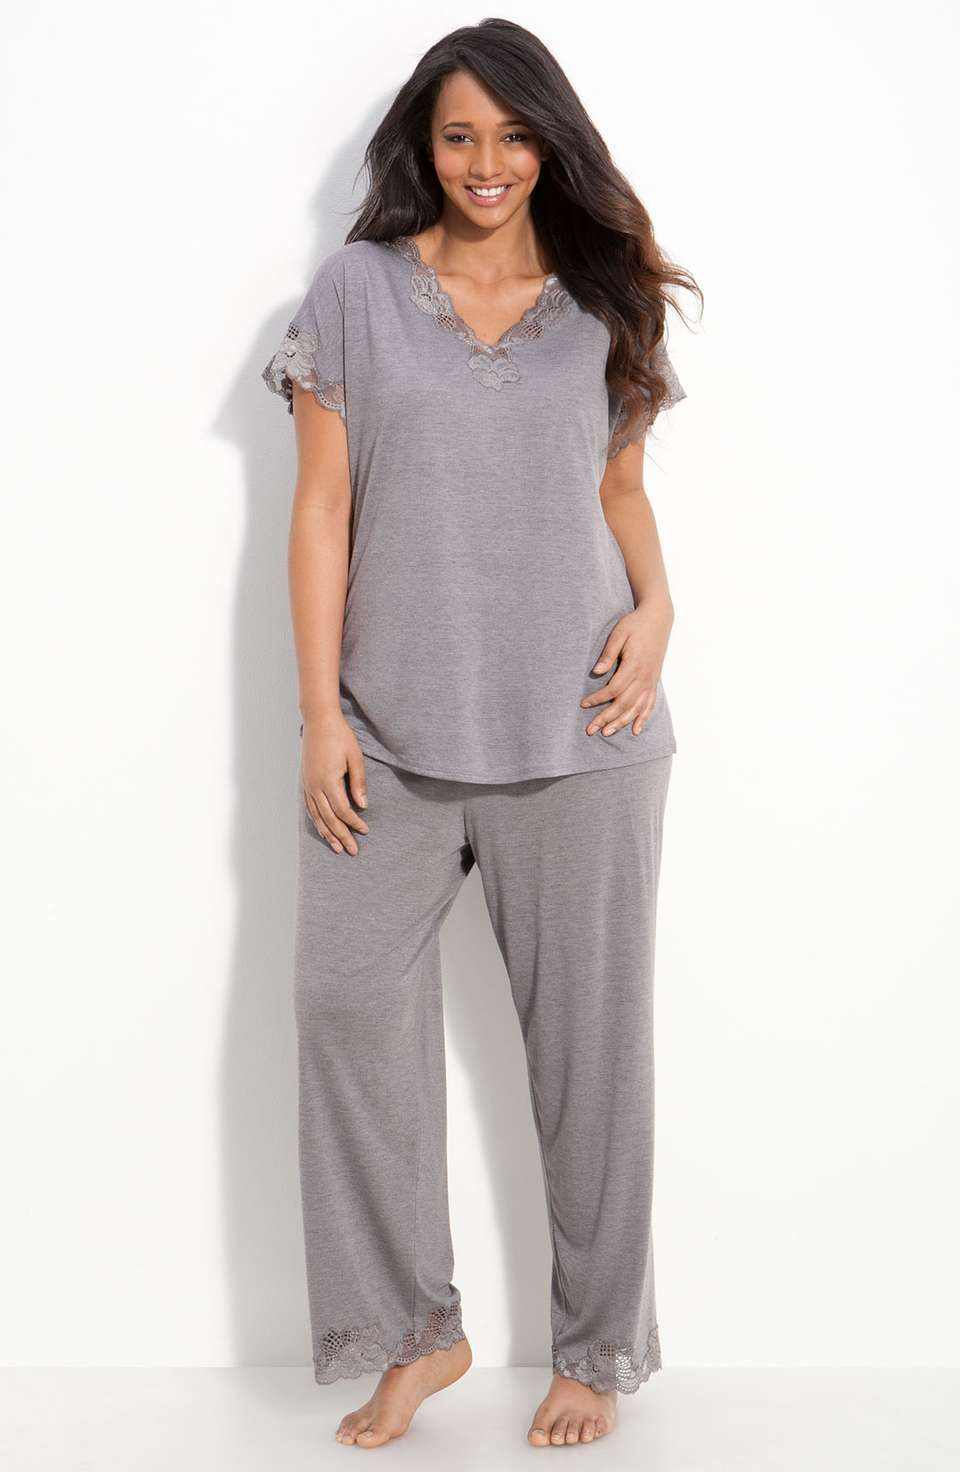 Natori Zen Floral Pajamas Plus Size Natori Plussize Pajamas Con Imagenes Ropa Ropa De Mujer Ropa De Dormir